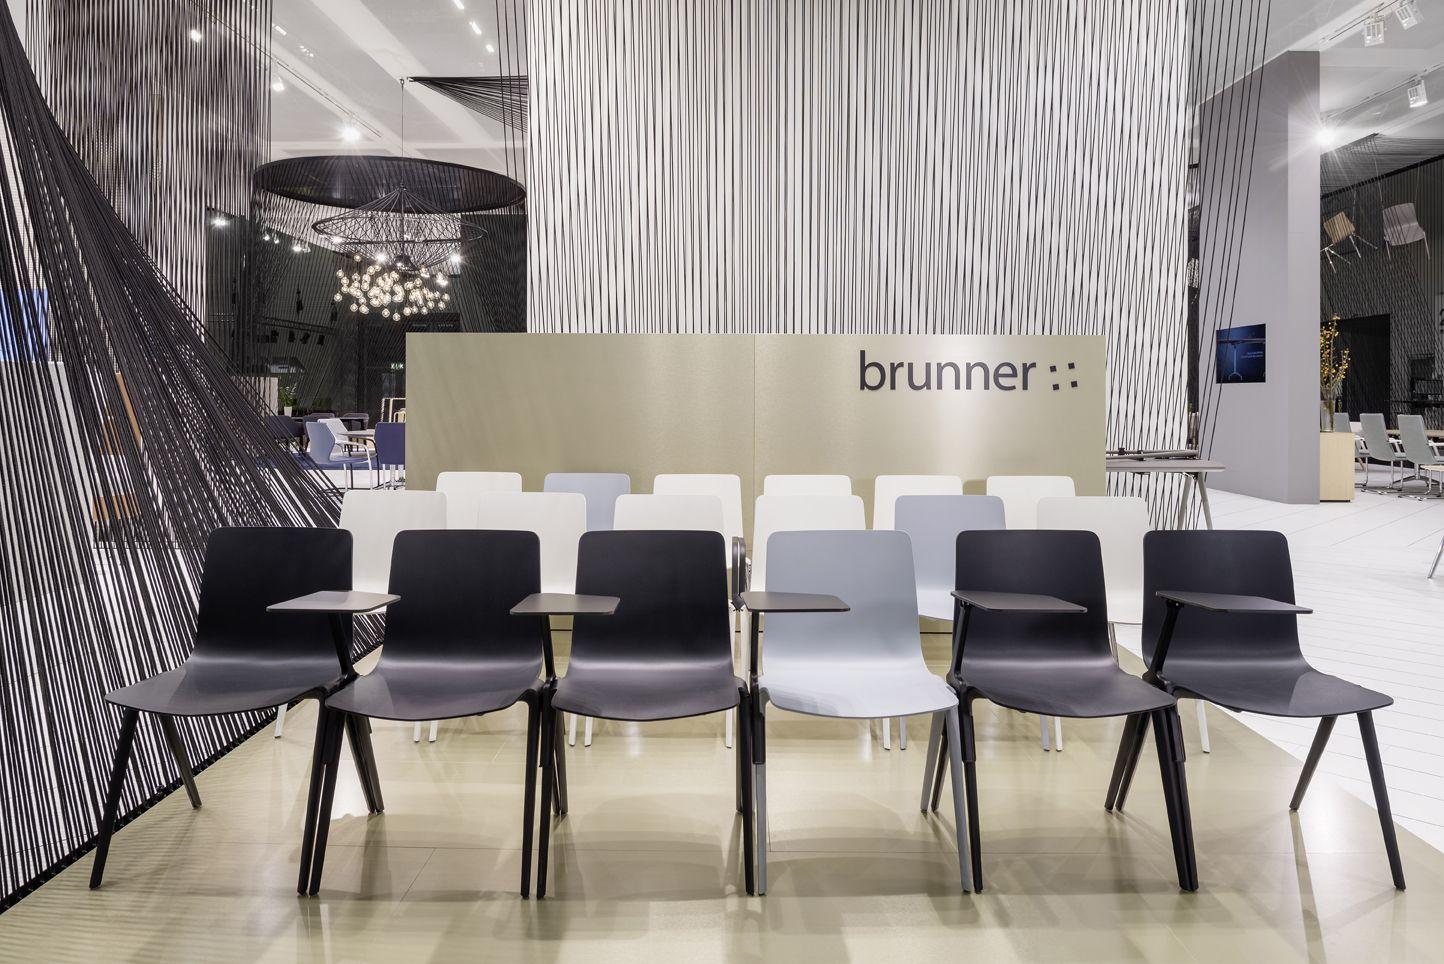 Brunner A-Chair at Orgatec 2014 Cologne http://www.brunner-group.com ...